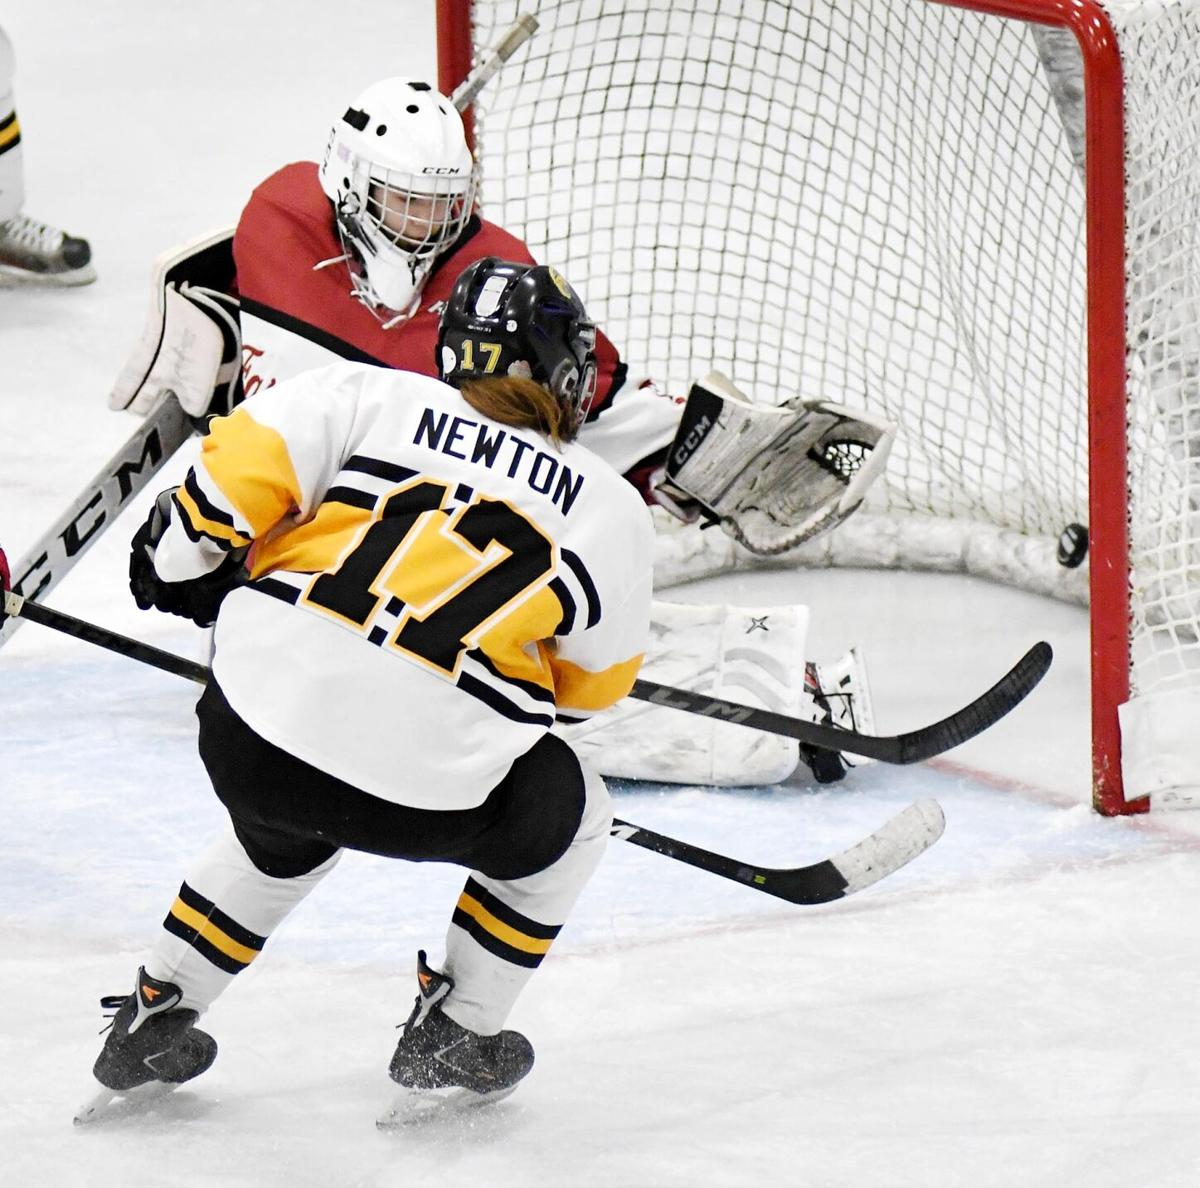 East/Loyola girls hockey vs. Fairmont2